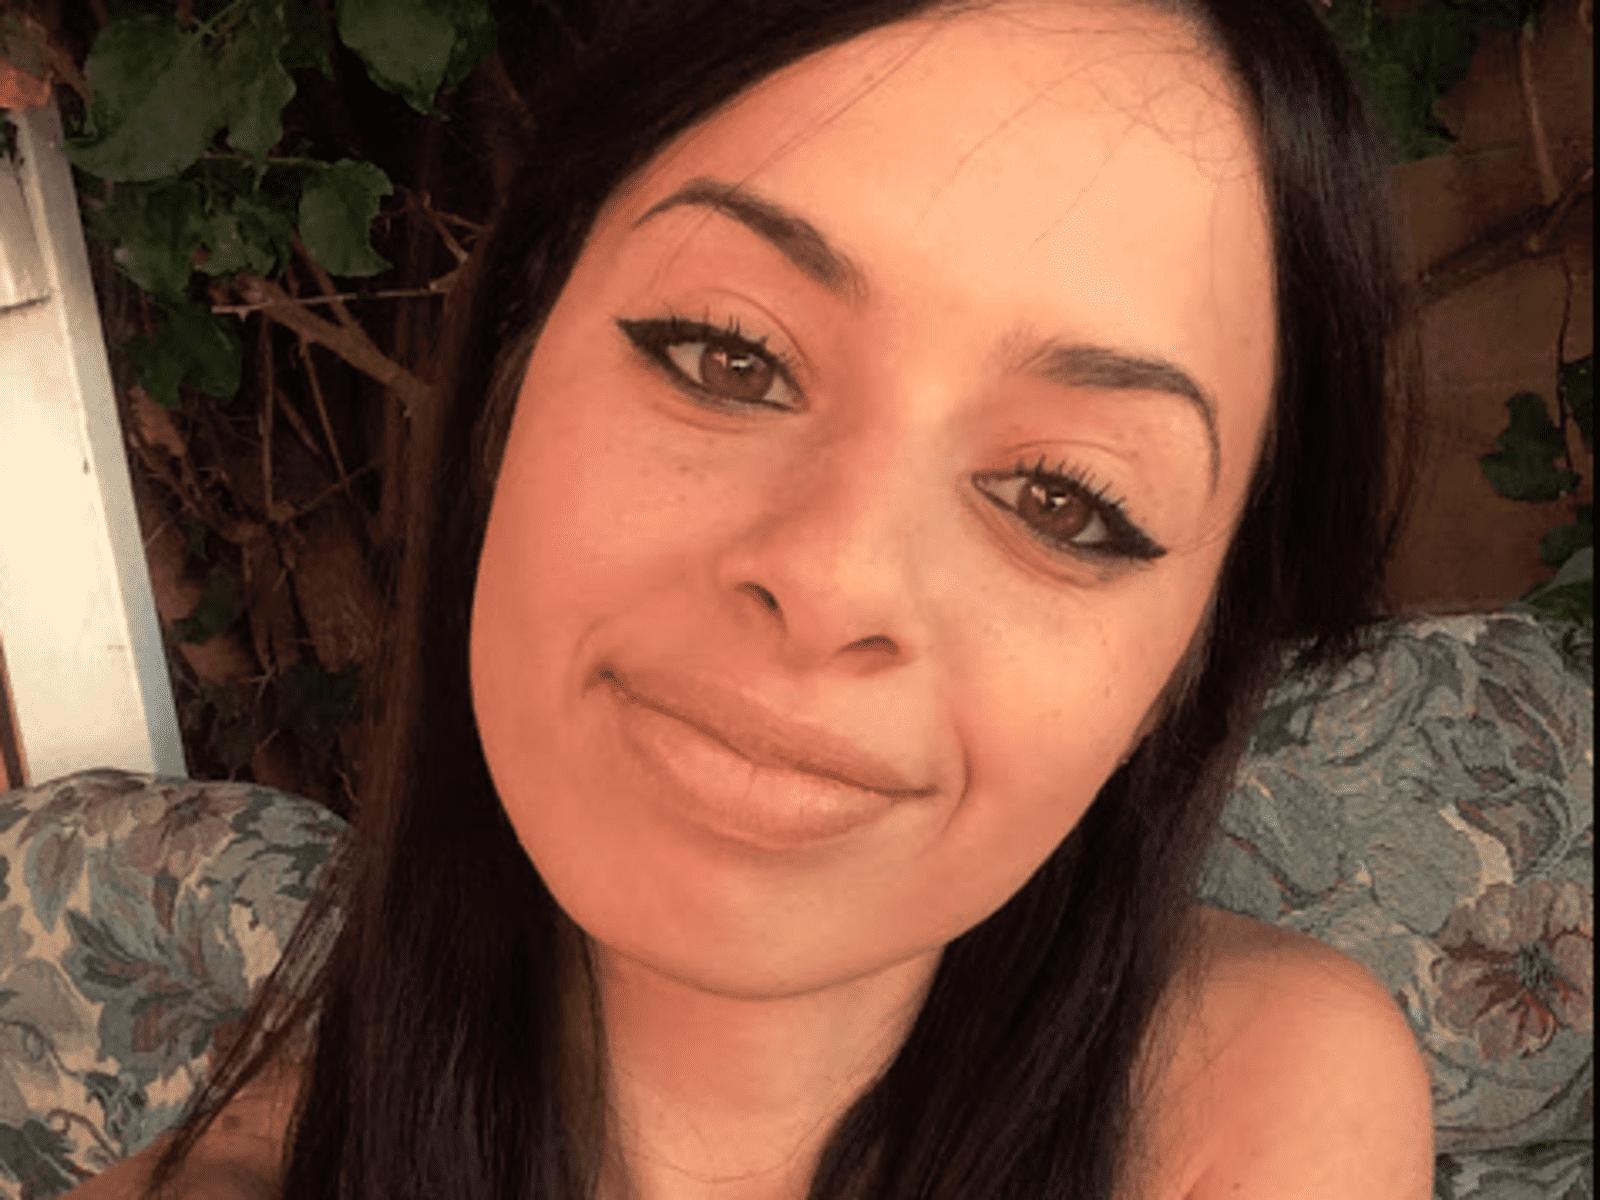 Yasmine from Los Angeles, California, United States